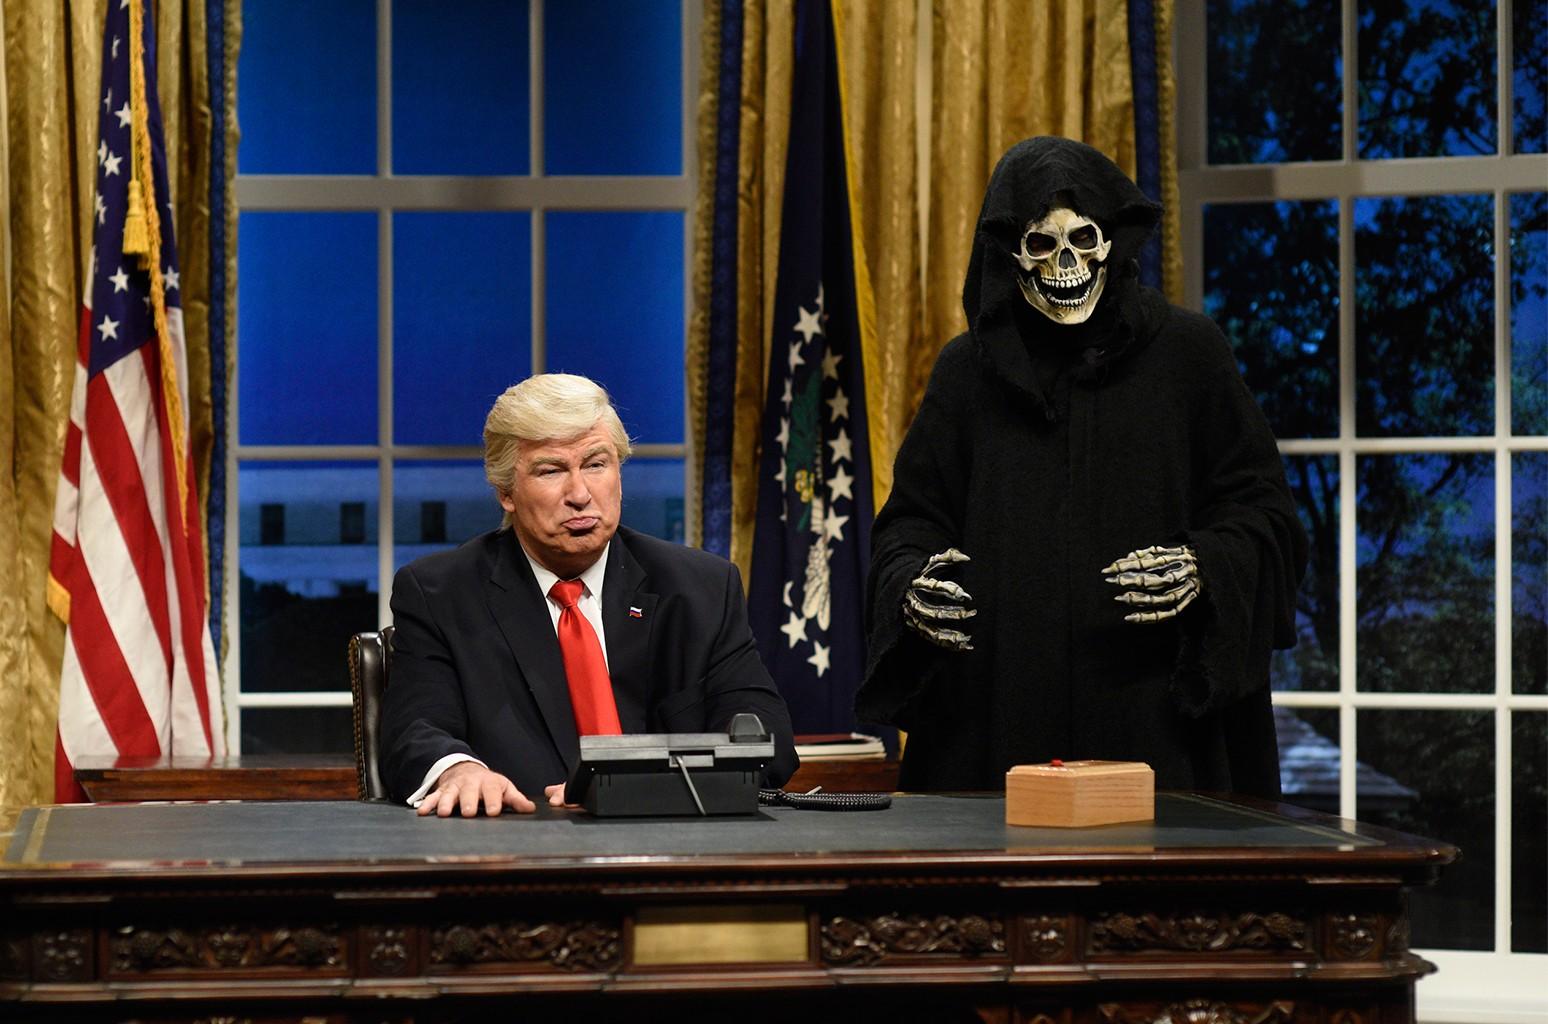 Alec Baldwin as President Donald J. Trump, Mikey Day as advisor Steve Bannon